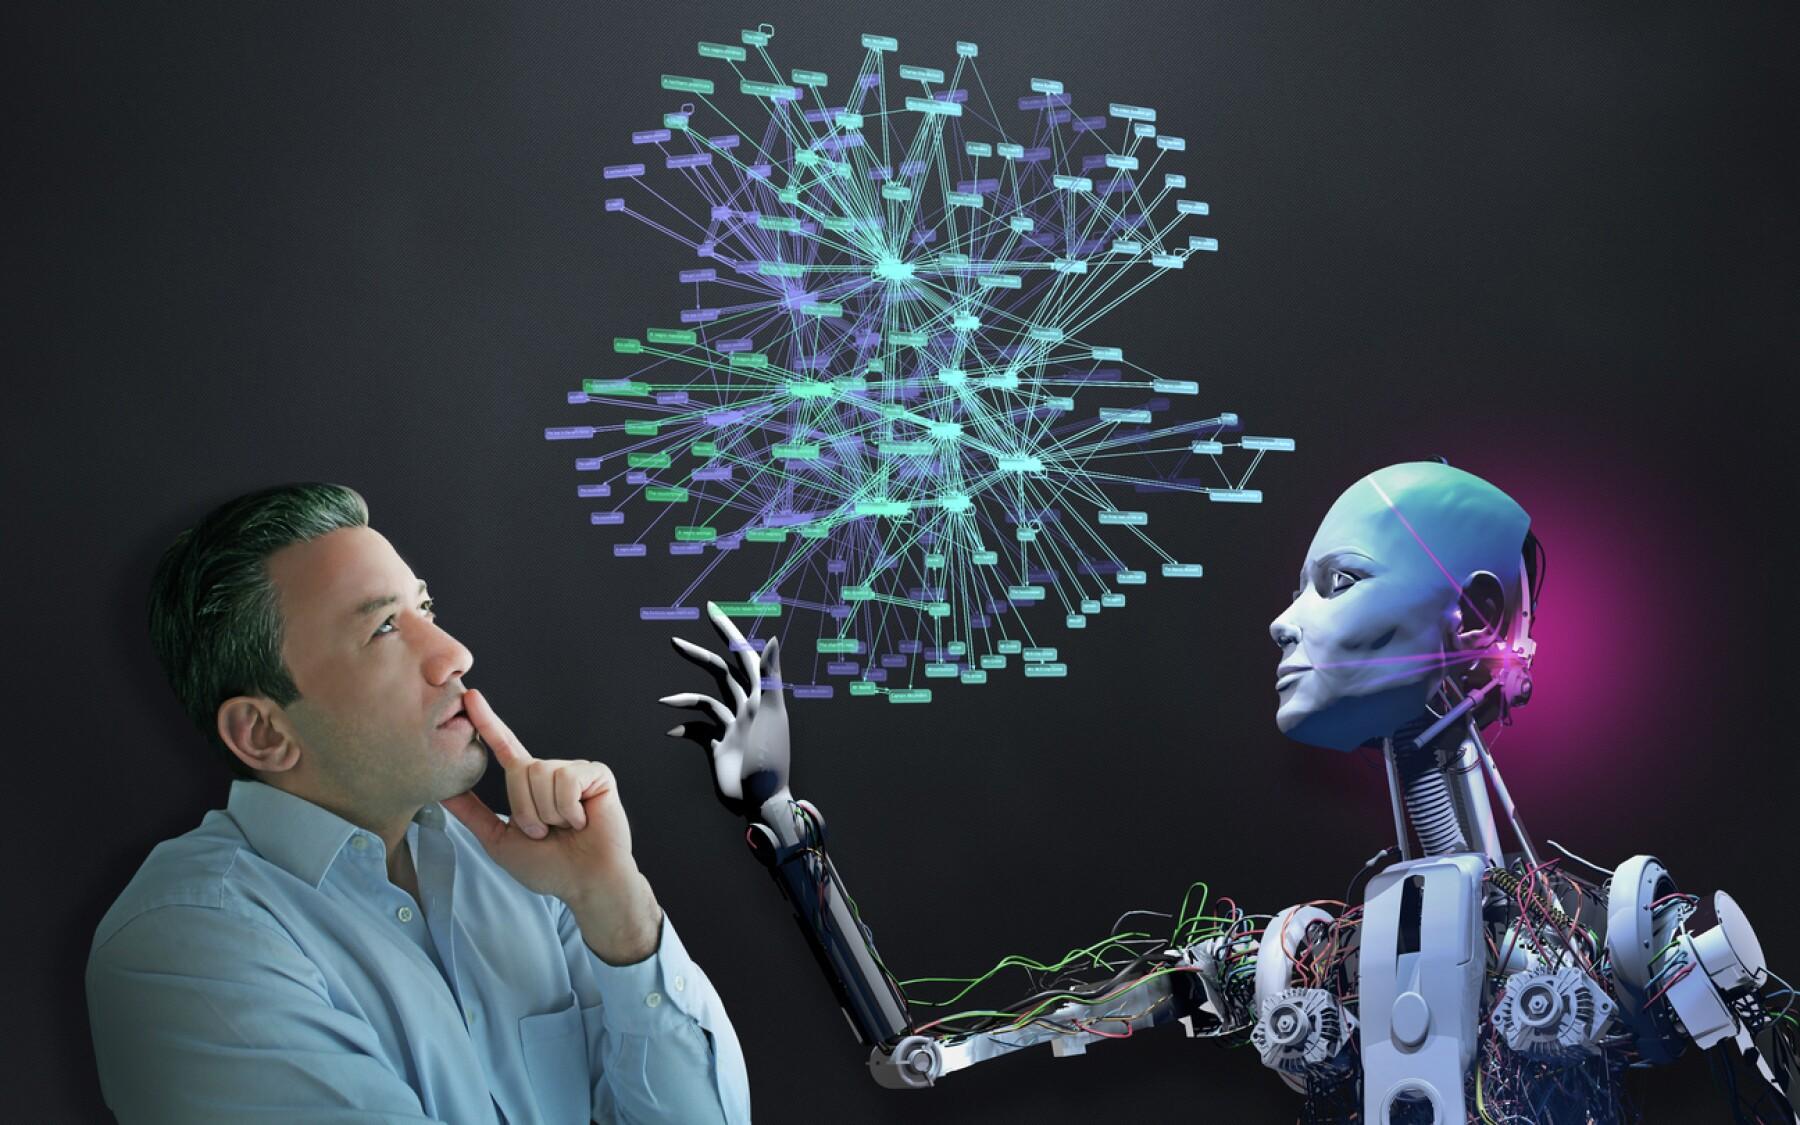 inteligencia artificial - negocios - tecnología congnitiva